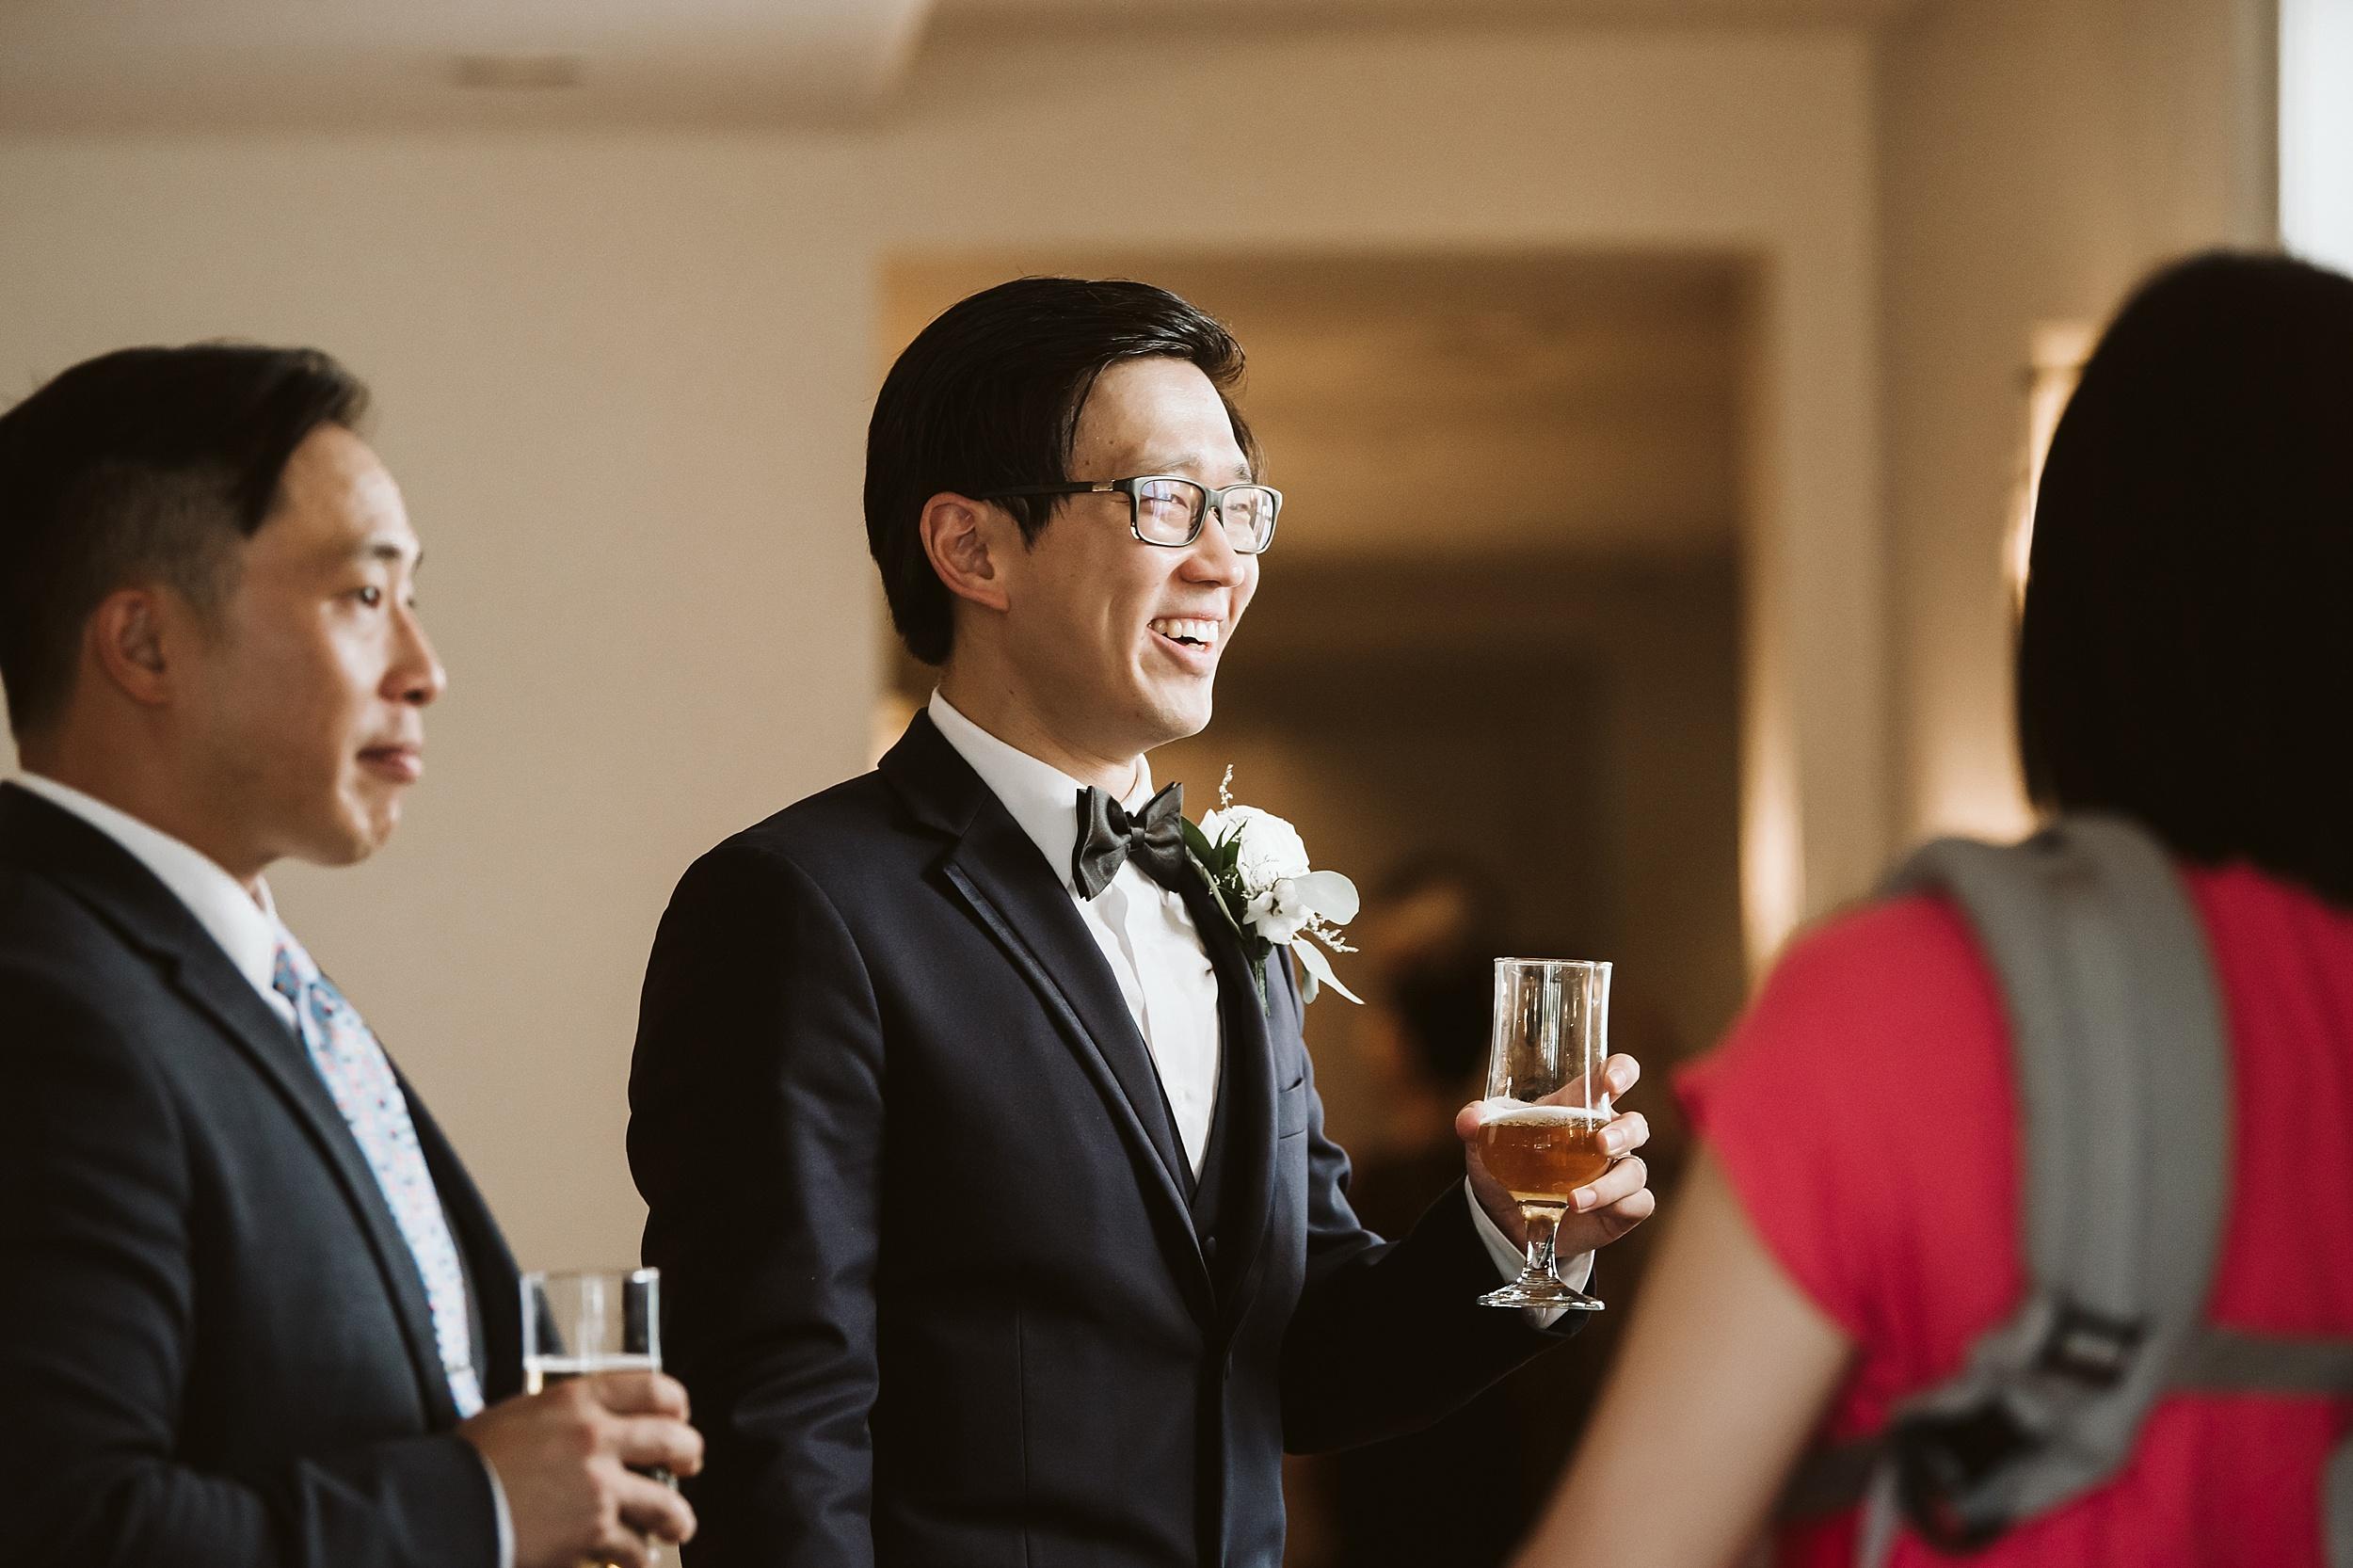 Doctors_House_Kleinburg_Wedding_Toronto_Photographer_0066.jpg